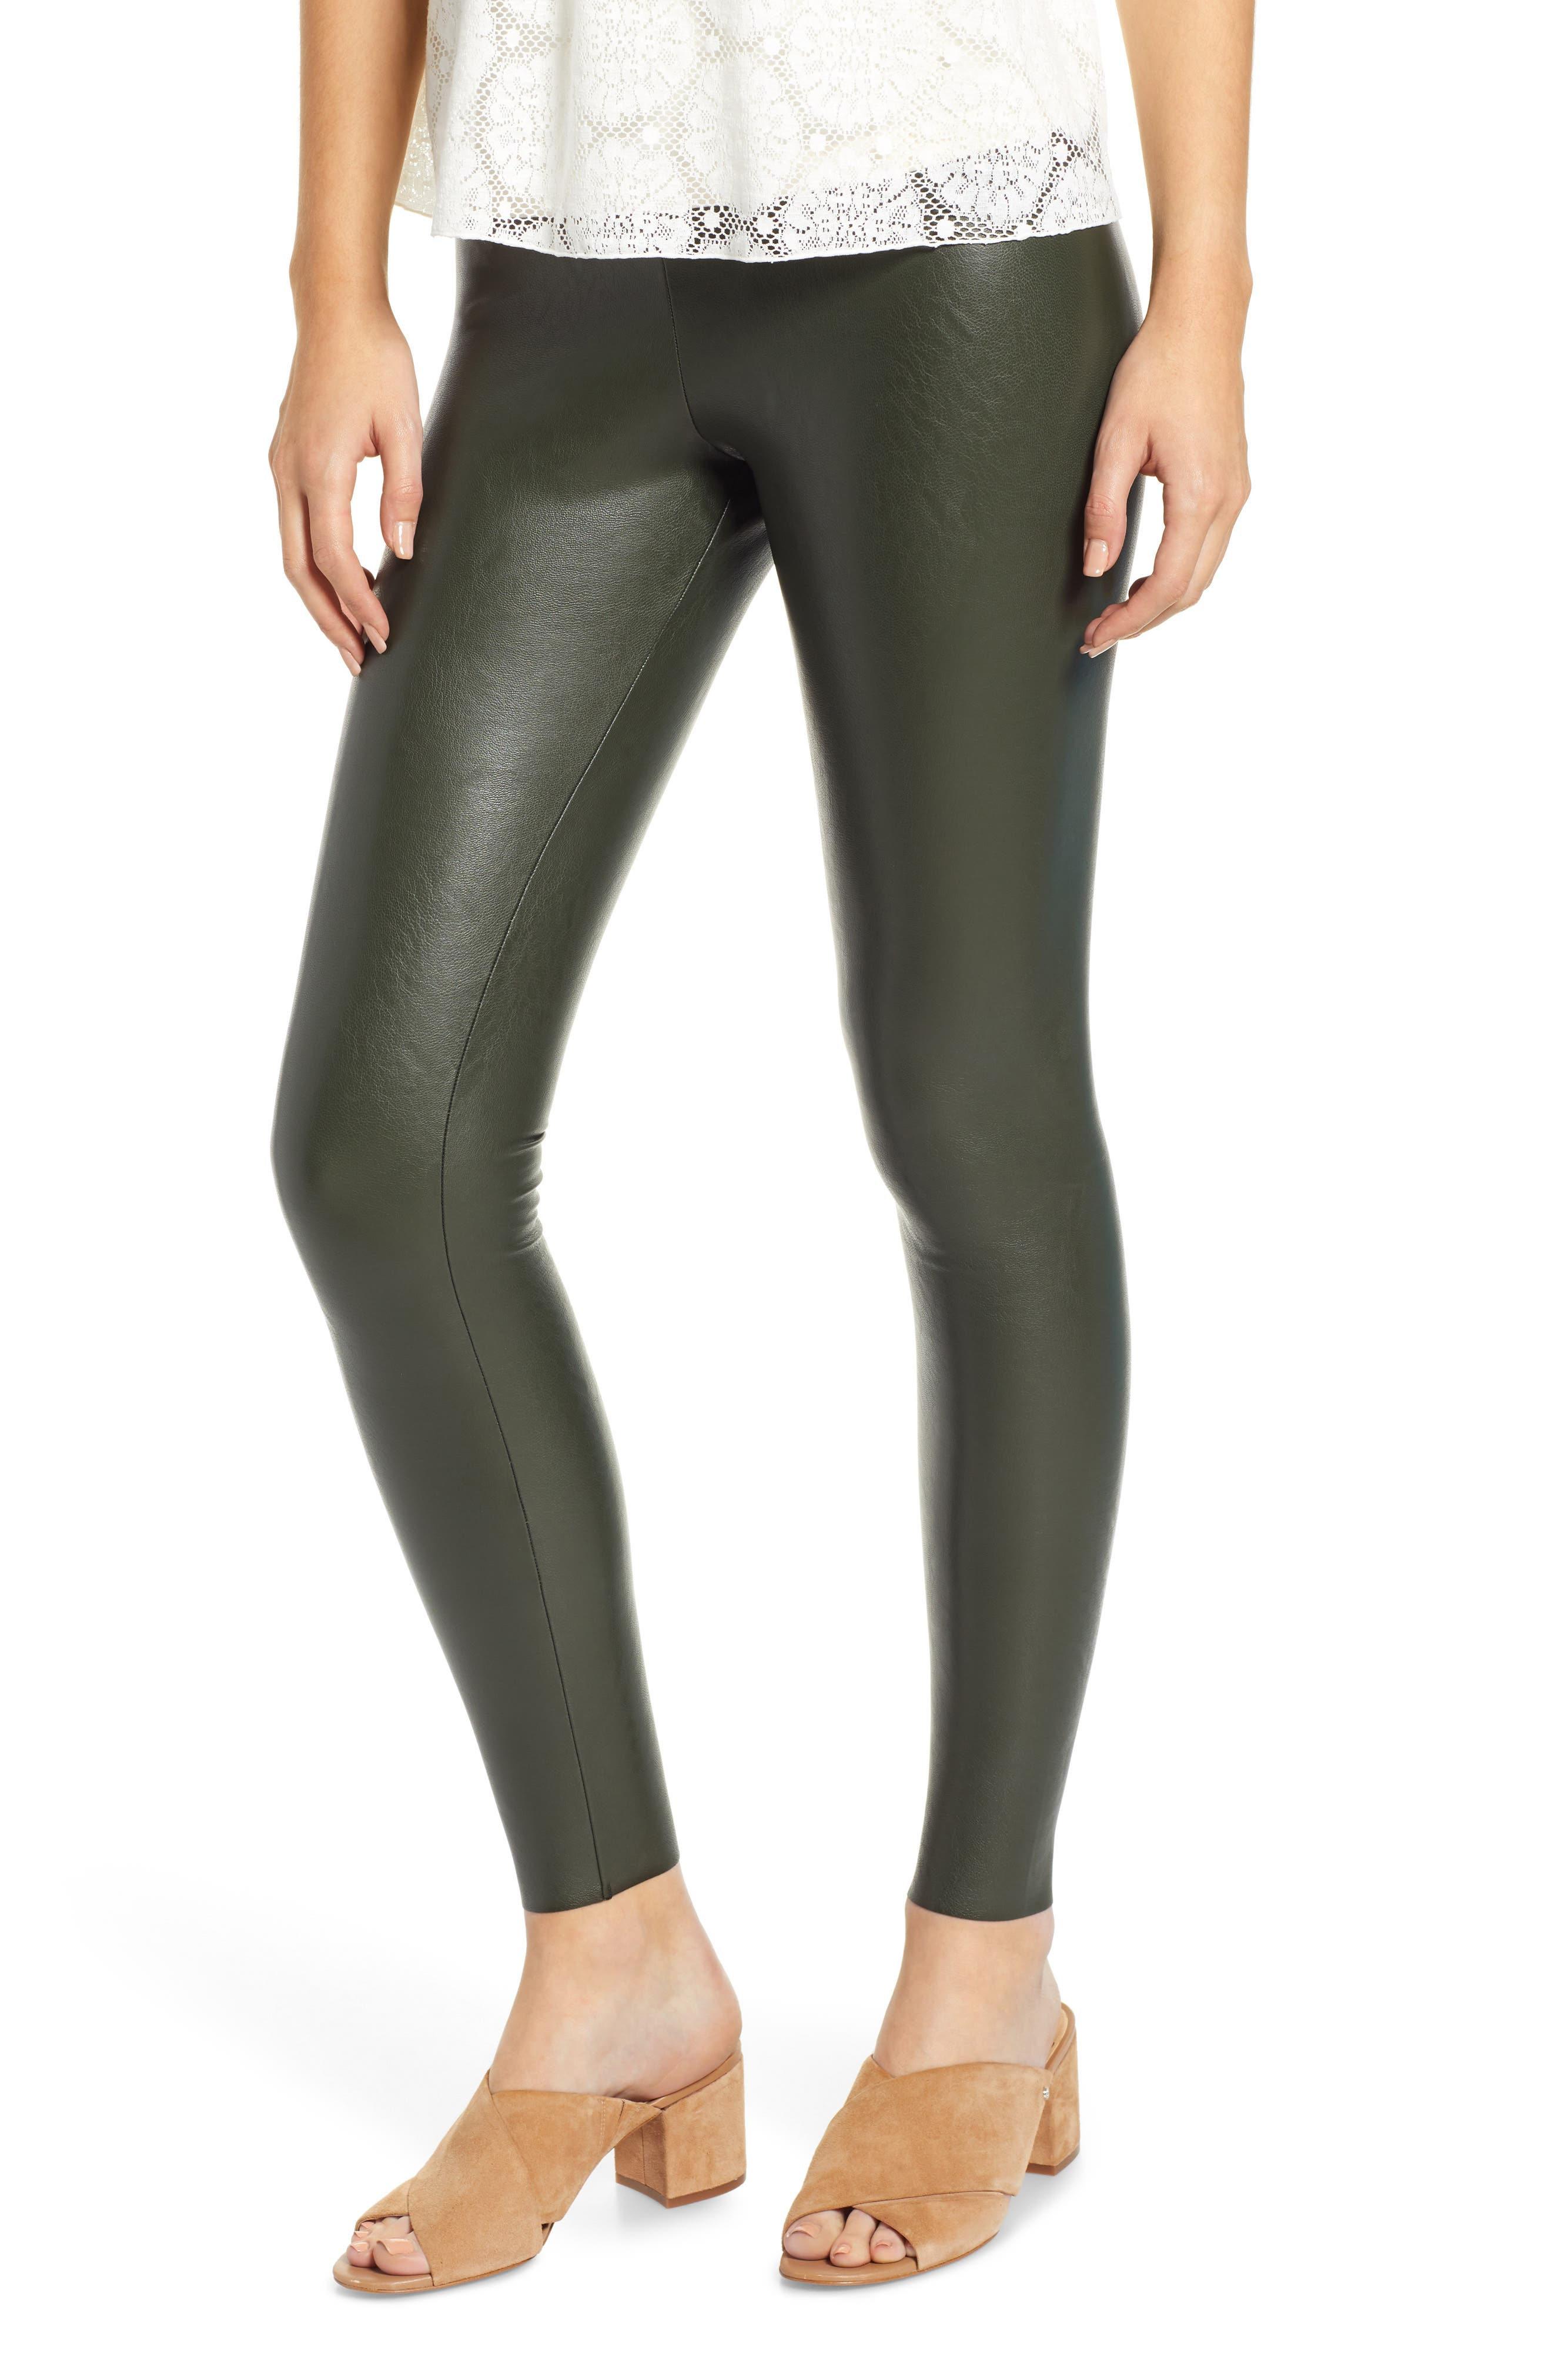 Commando Perfect Control Faux Leather Leggings, Green